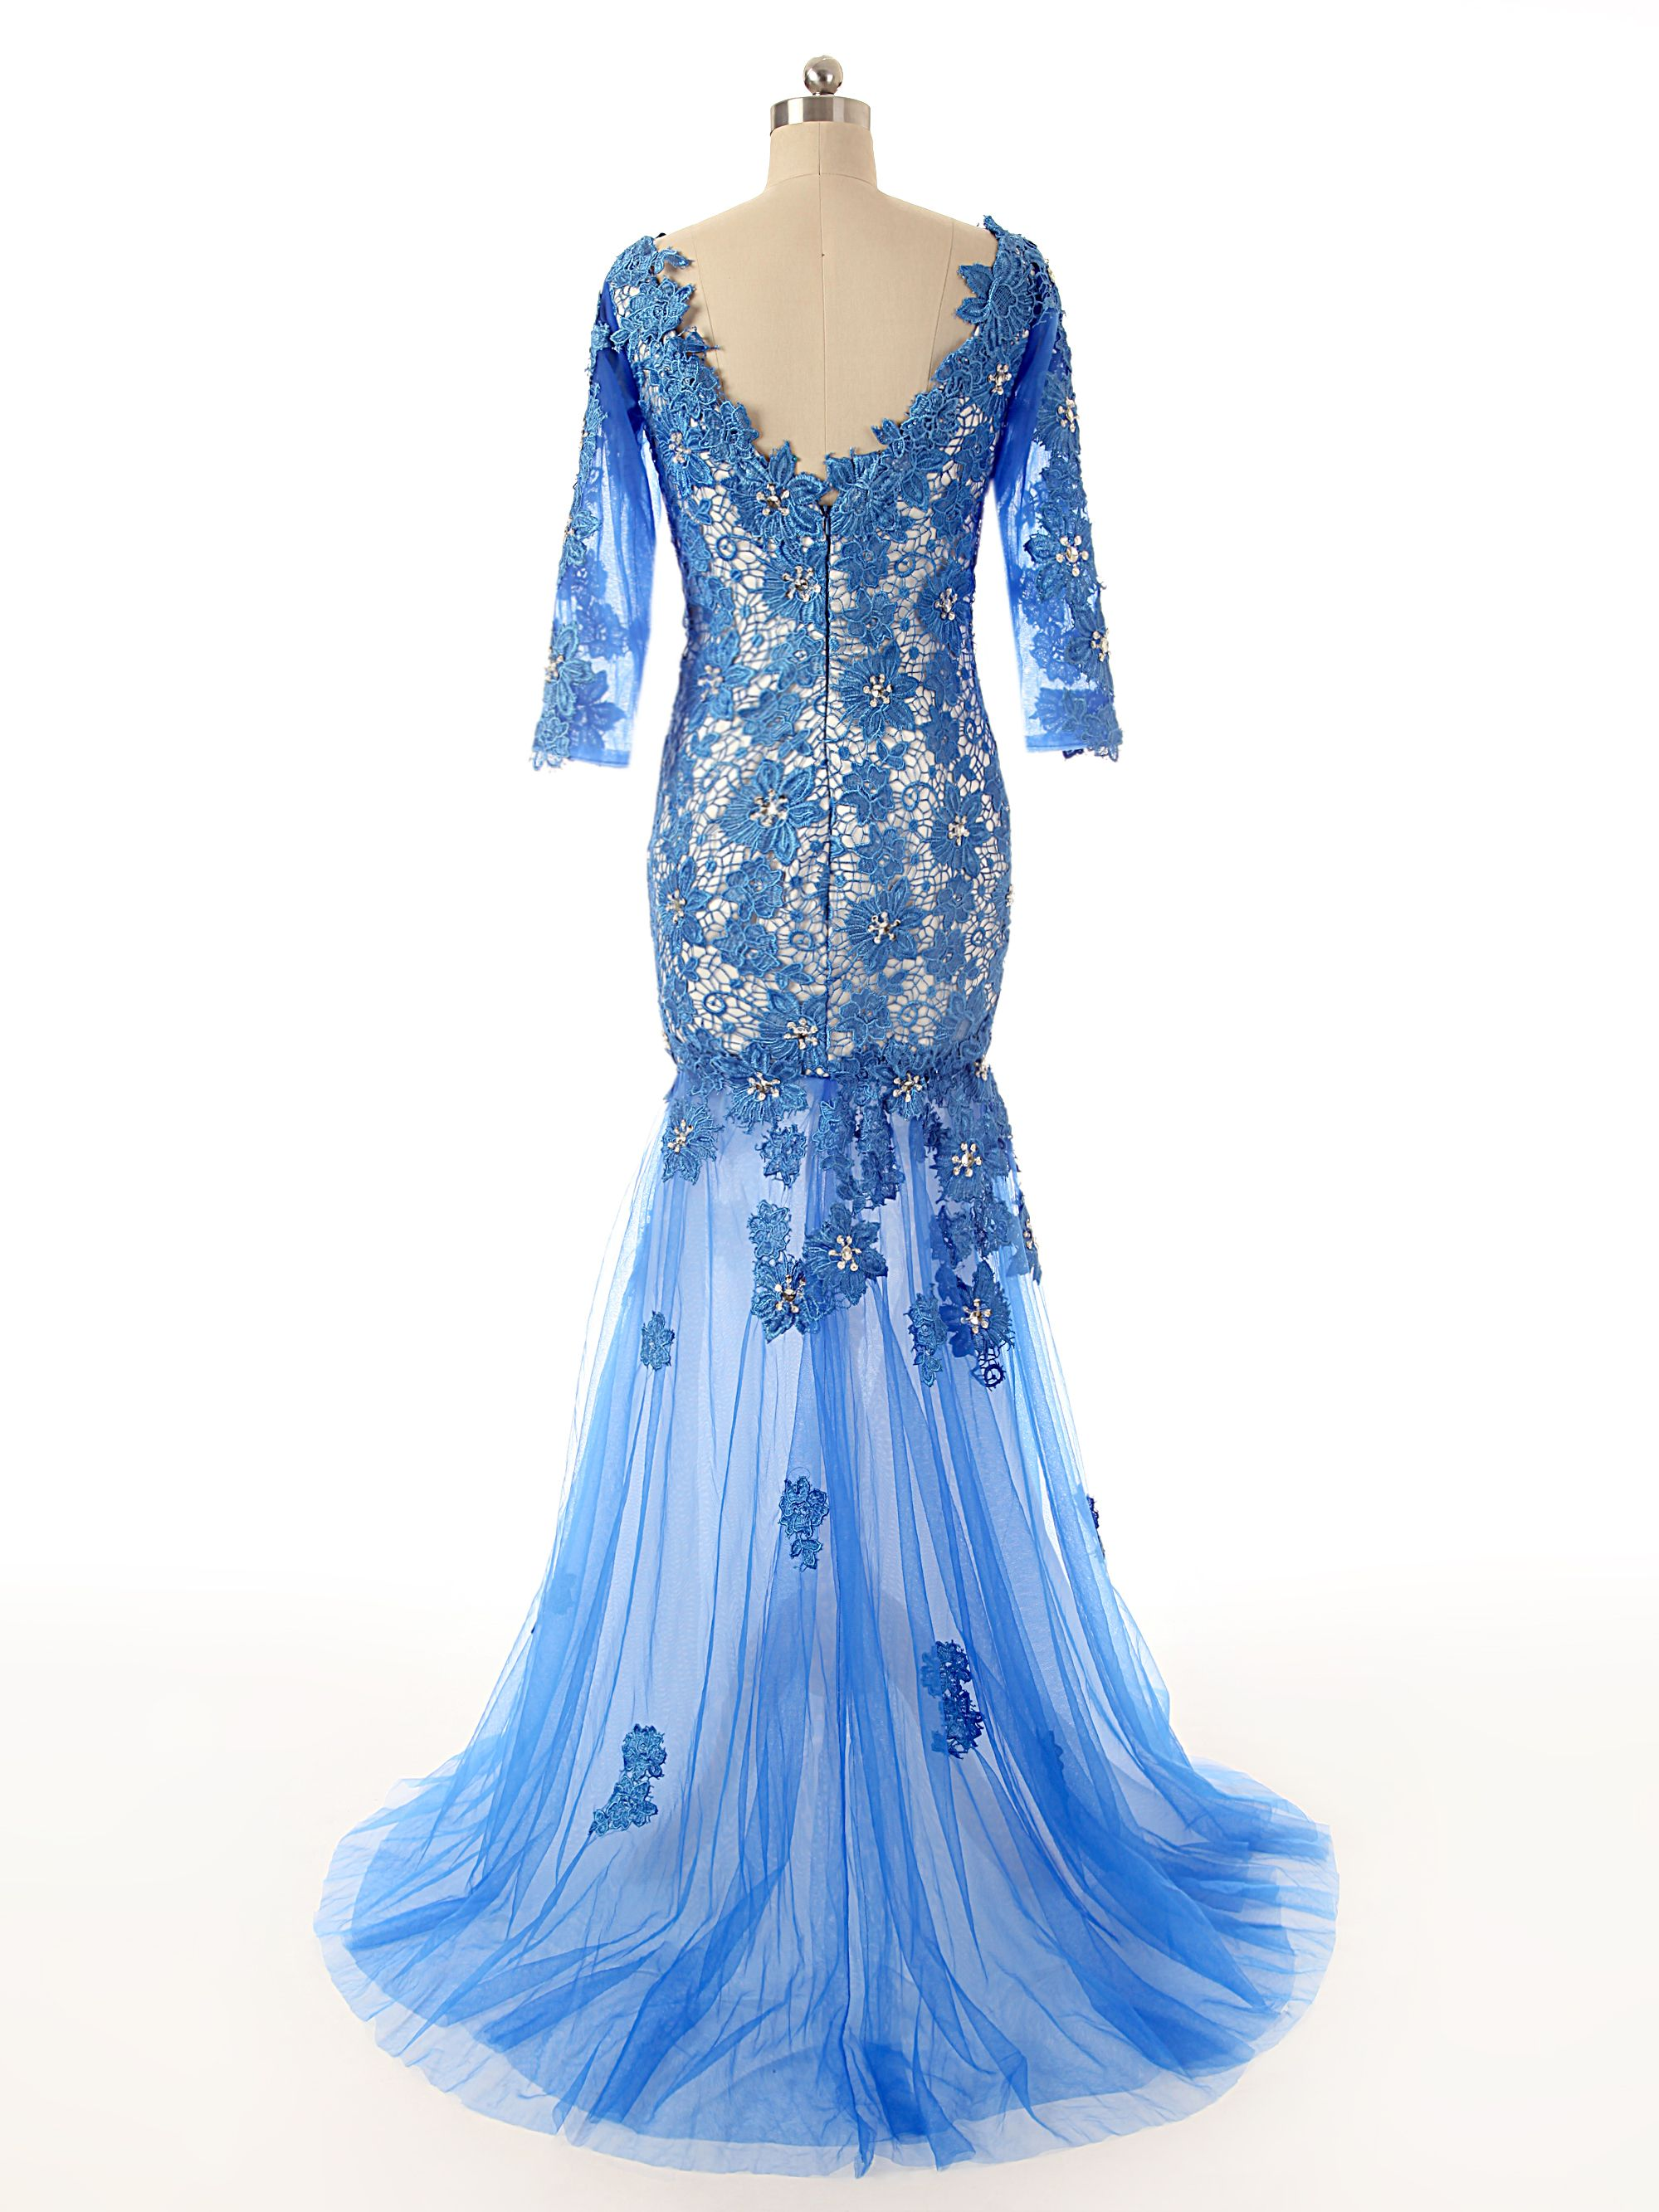 A half sleeve sexy seethrough mermaid evening gownslace